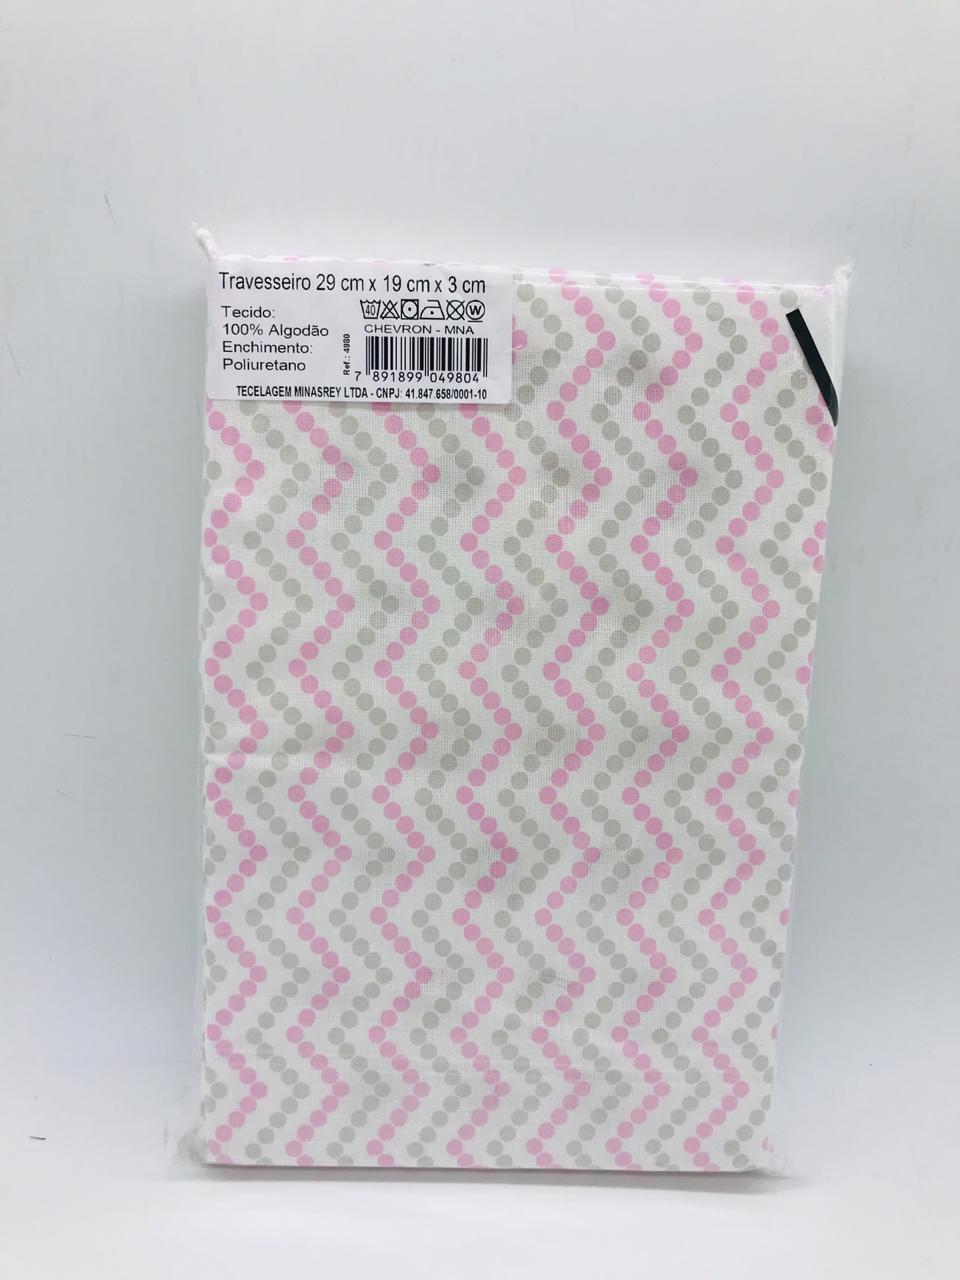 Travesseiro Compose Chevron Rosa e Cinza - Baby Gijo Ref 4980